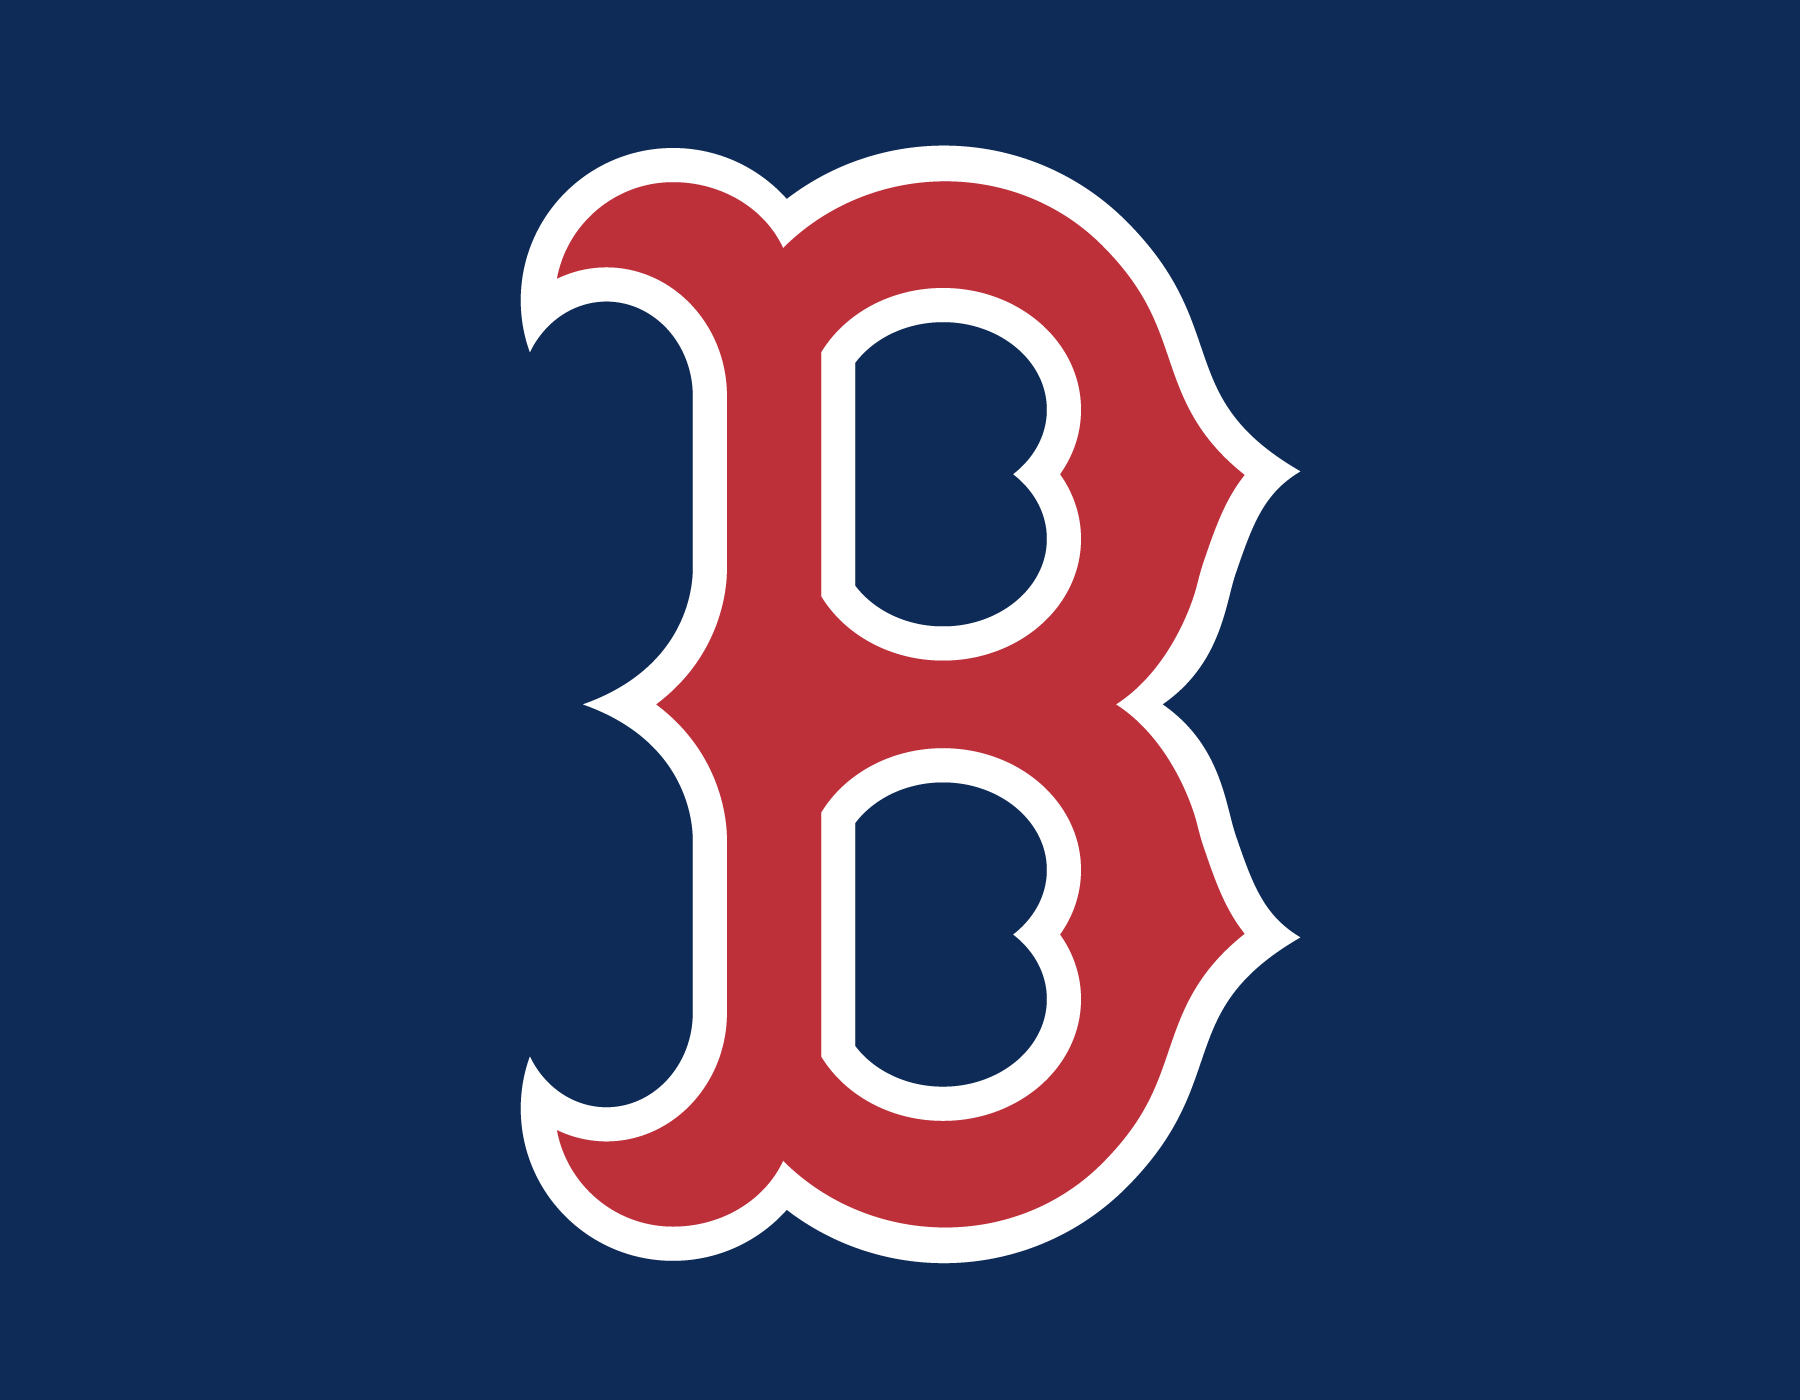 Sox Logos